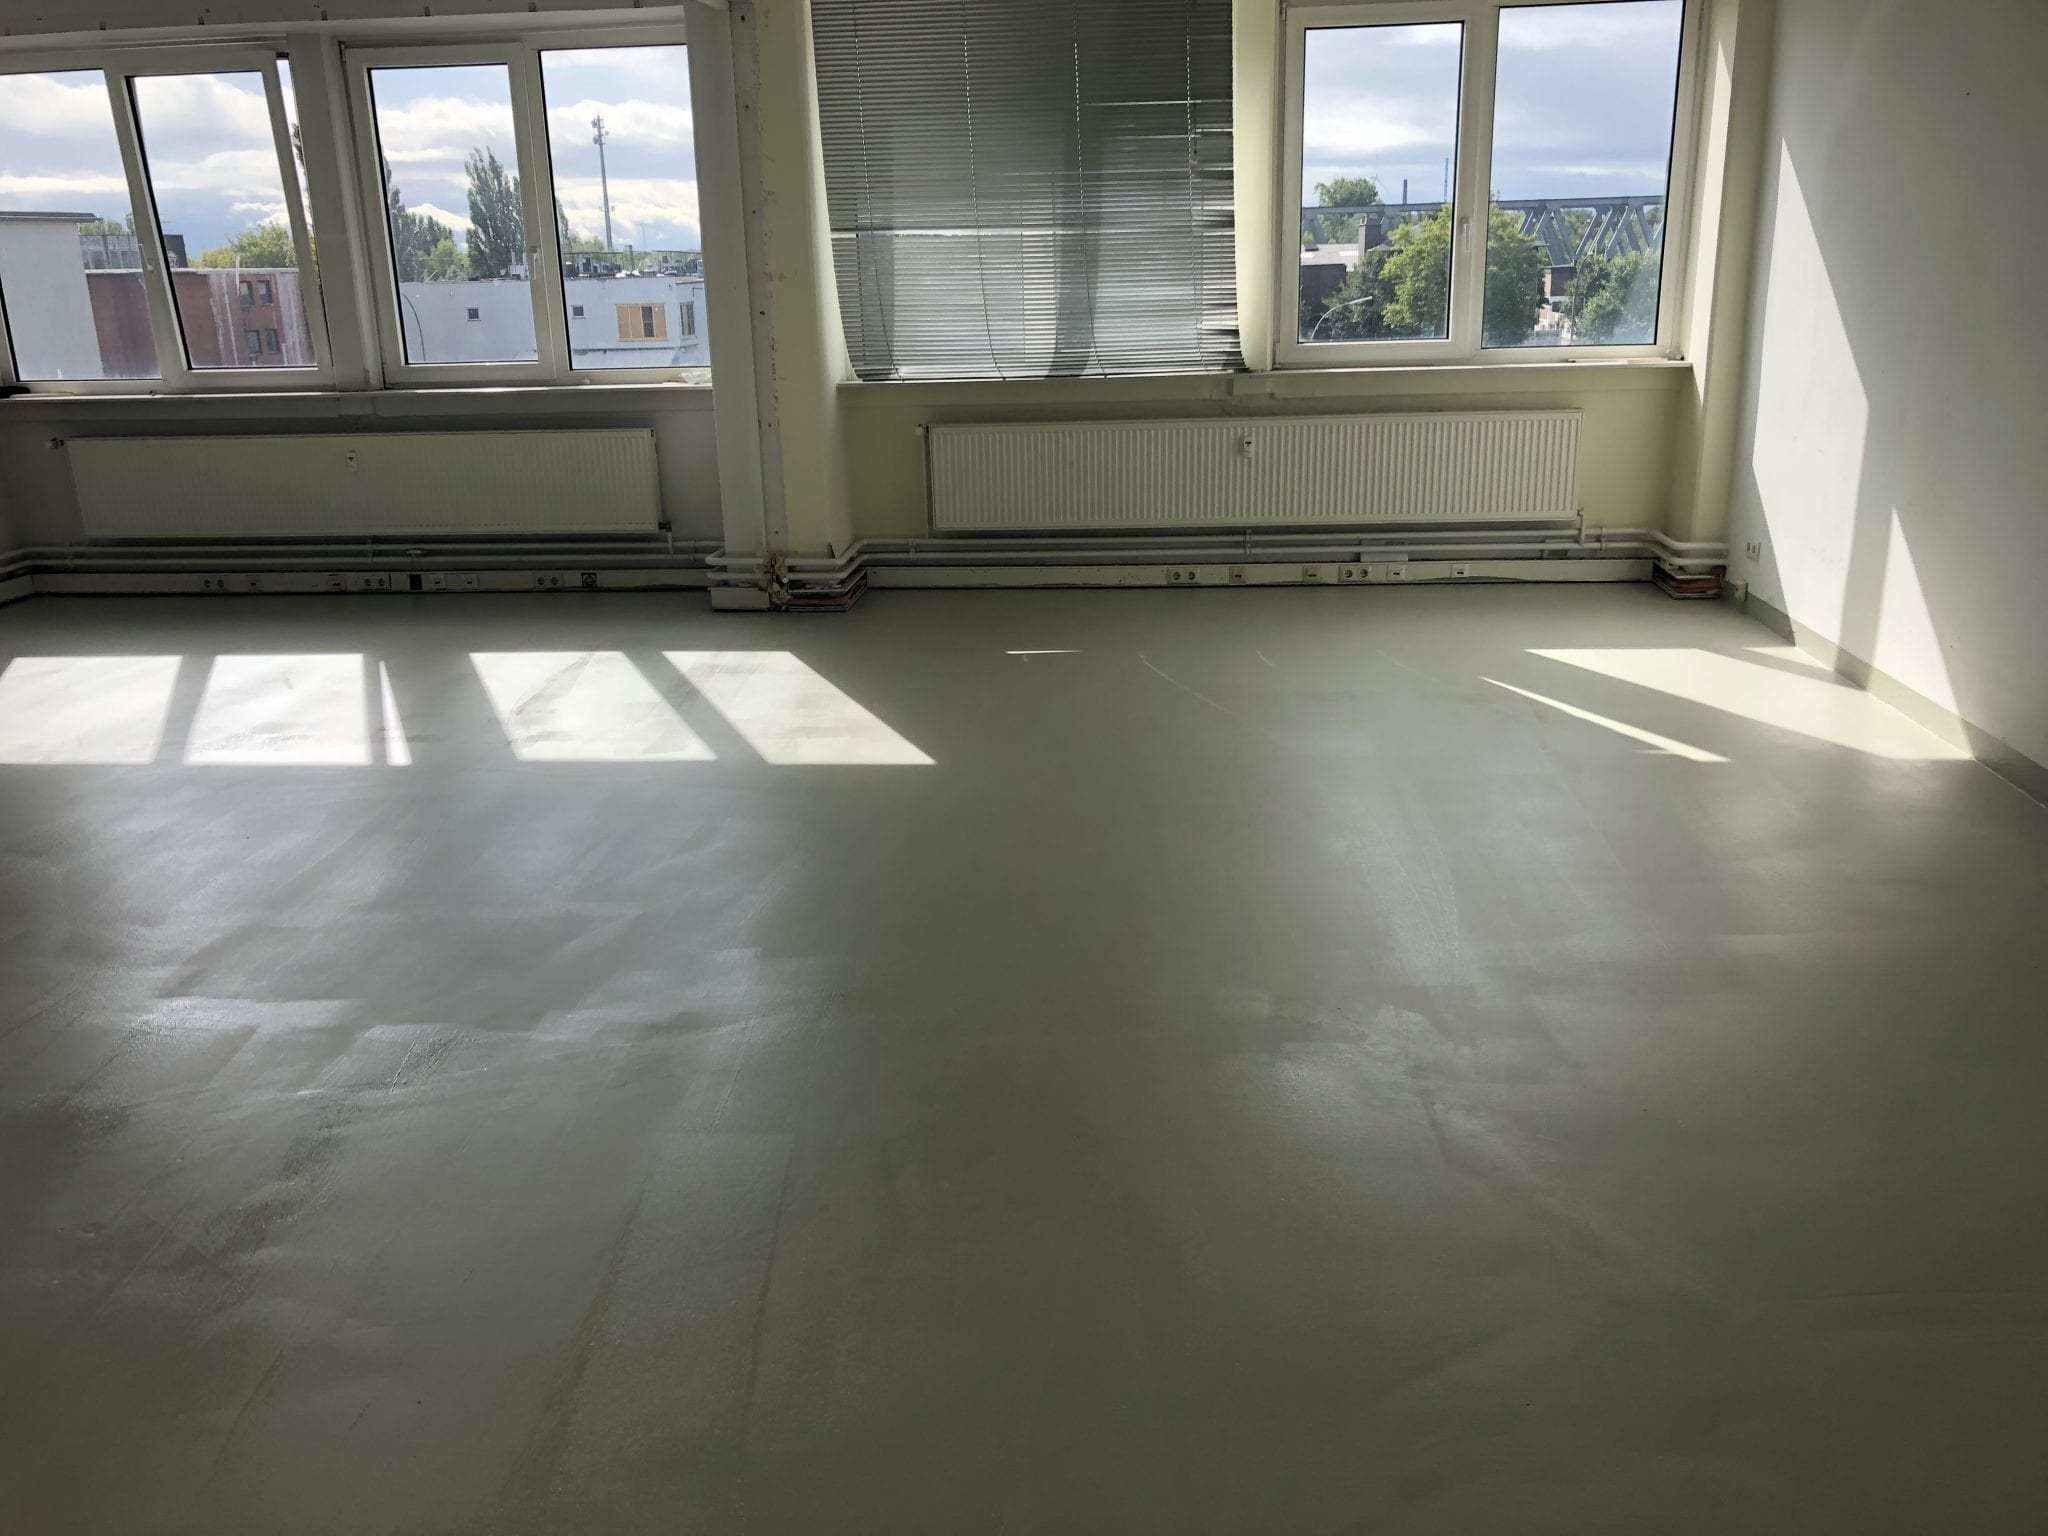 Fußboden Verlegen Ahrensburg ~ Fußbodenleger ahrensburg u2013 boden verlegen ab 9 u20ac m²